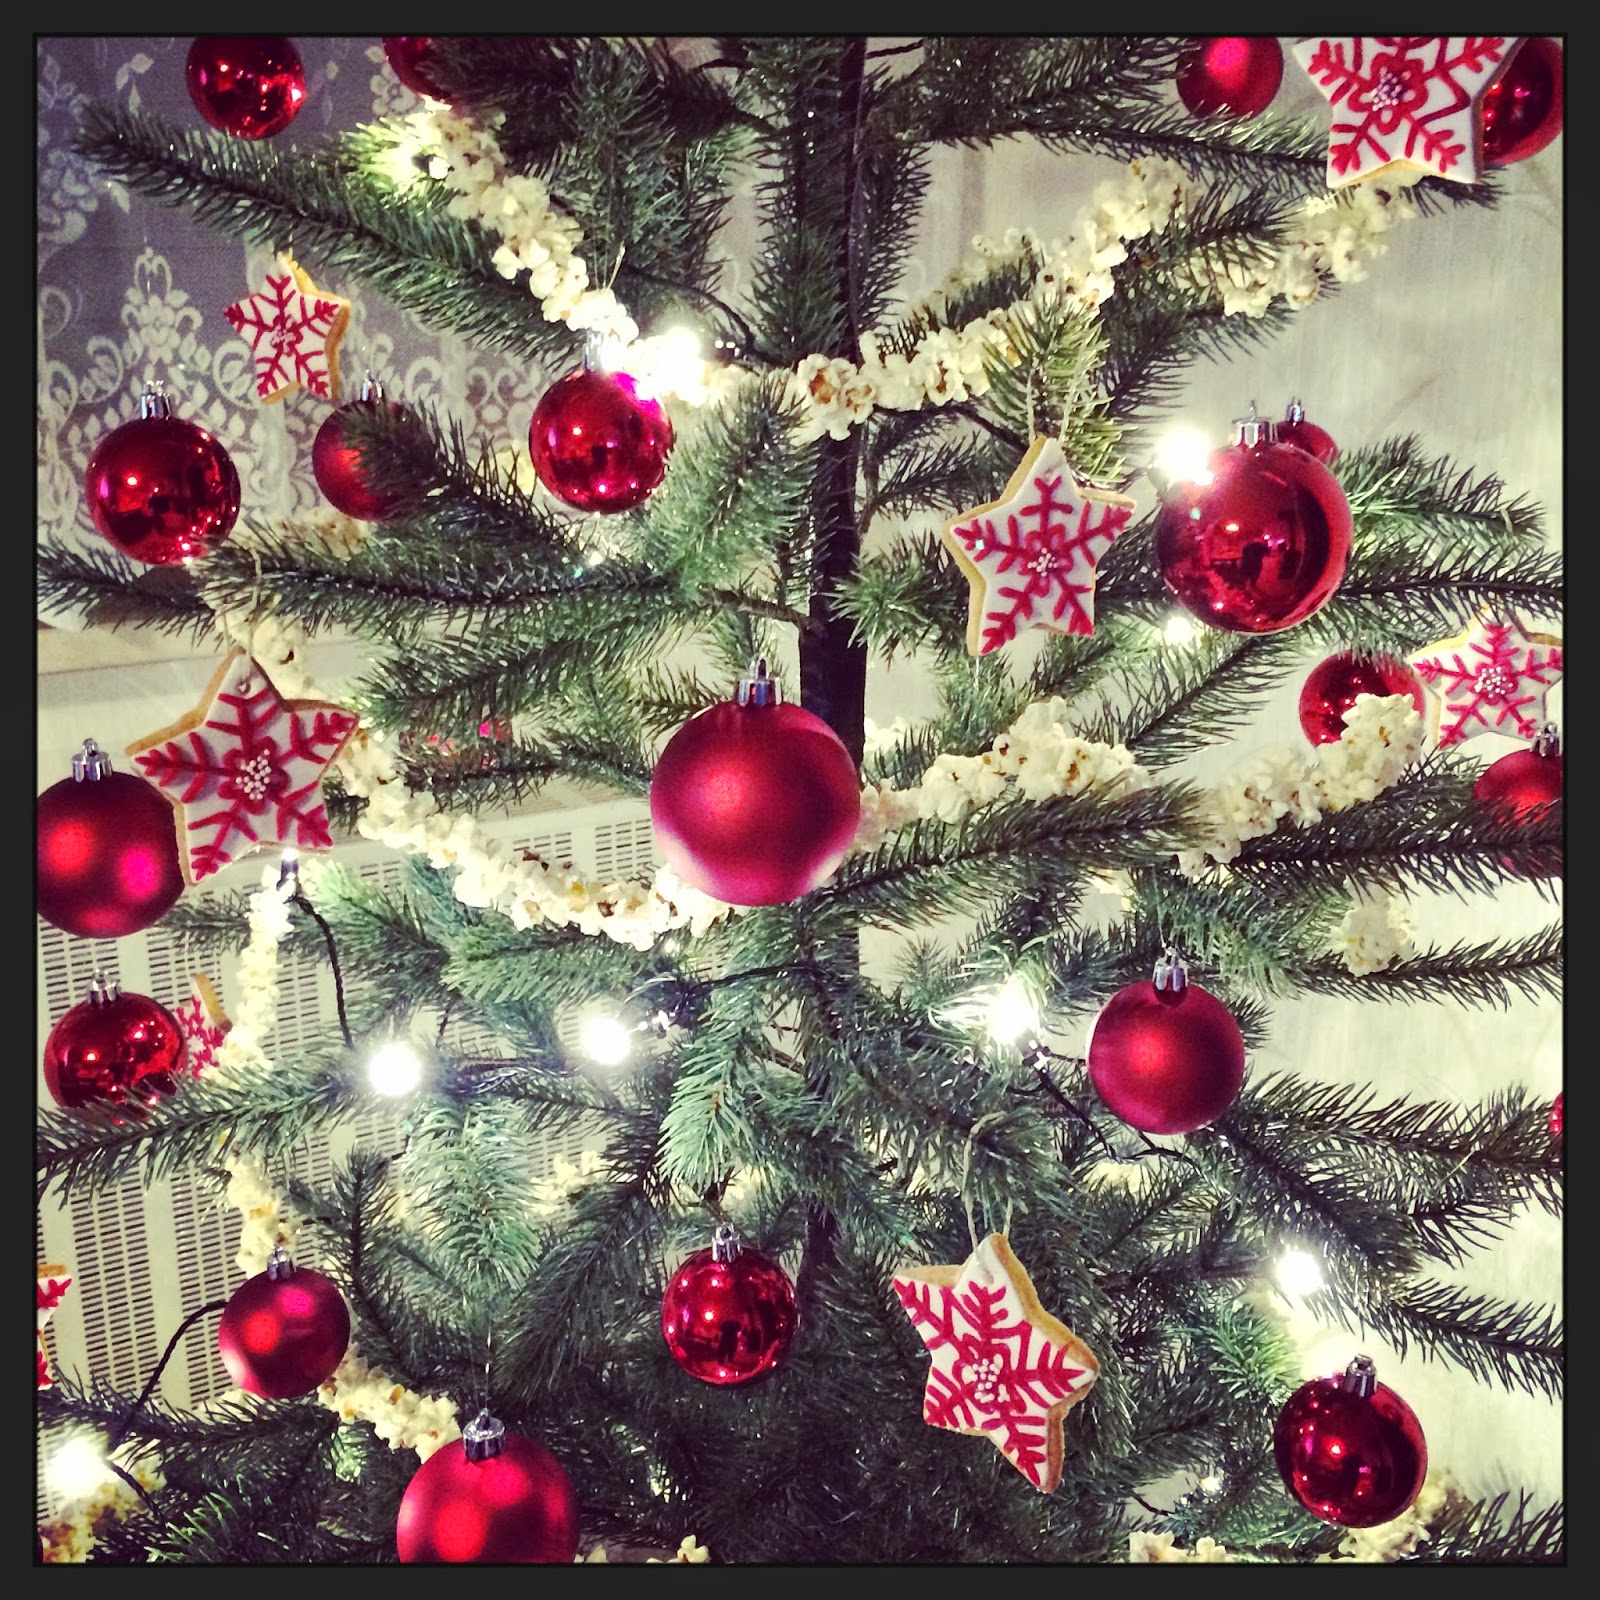 Apfelstrudel kuchen decoraci n comestible para el rbol for Decoracion para navidad 2014